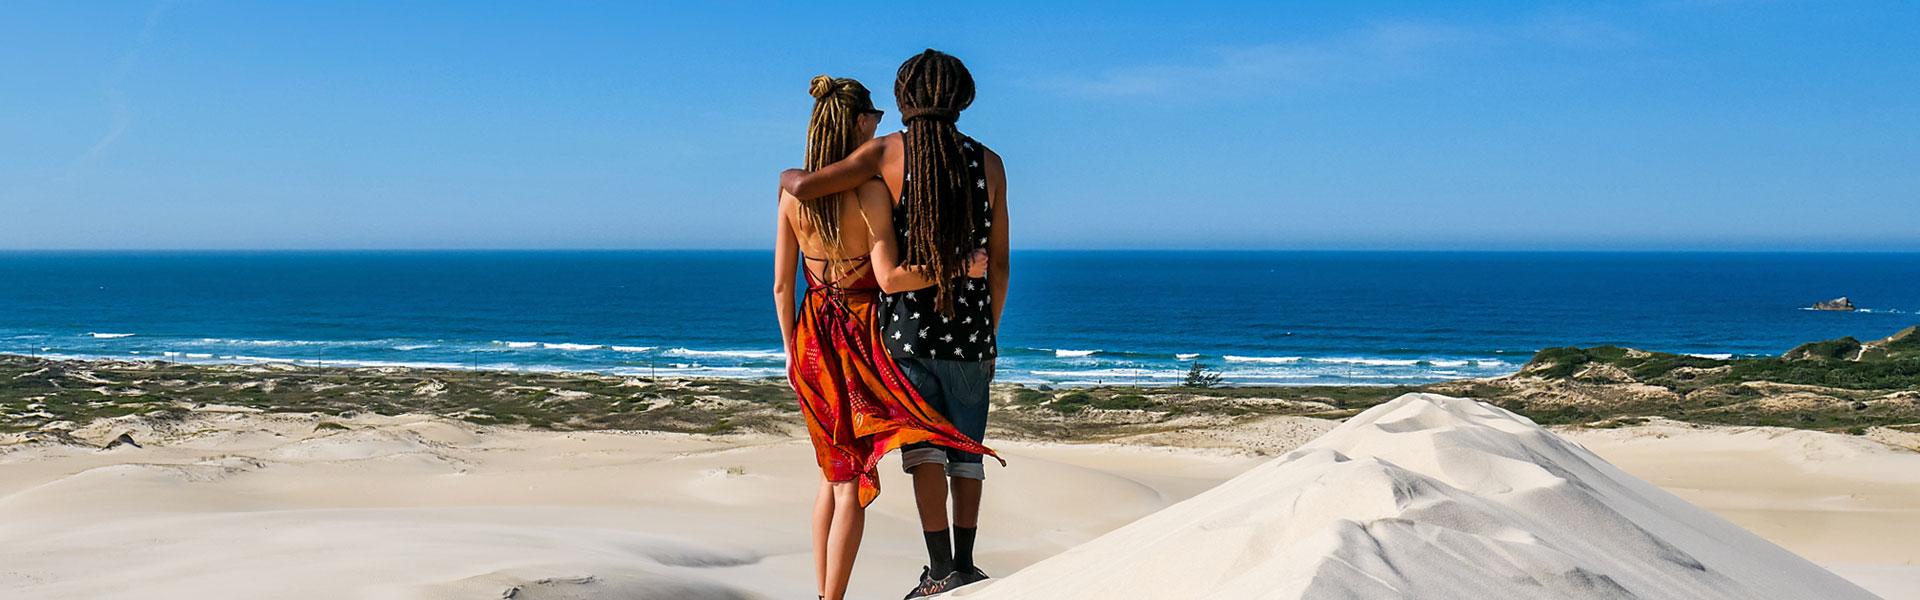 Rasta couple in Dunas da Ribanceira with ocean view in Imbituba, Brazil